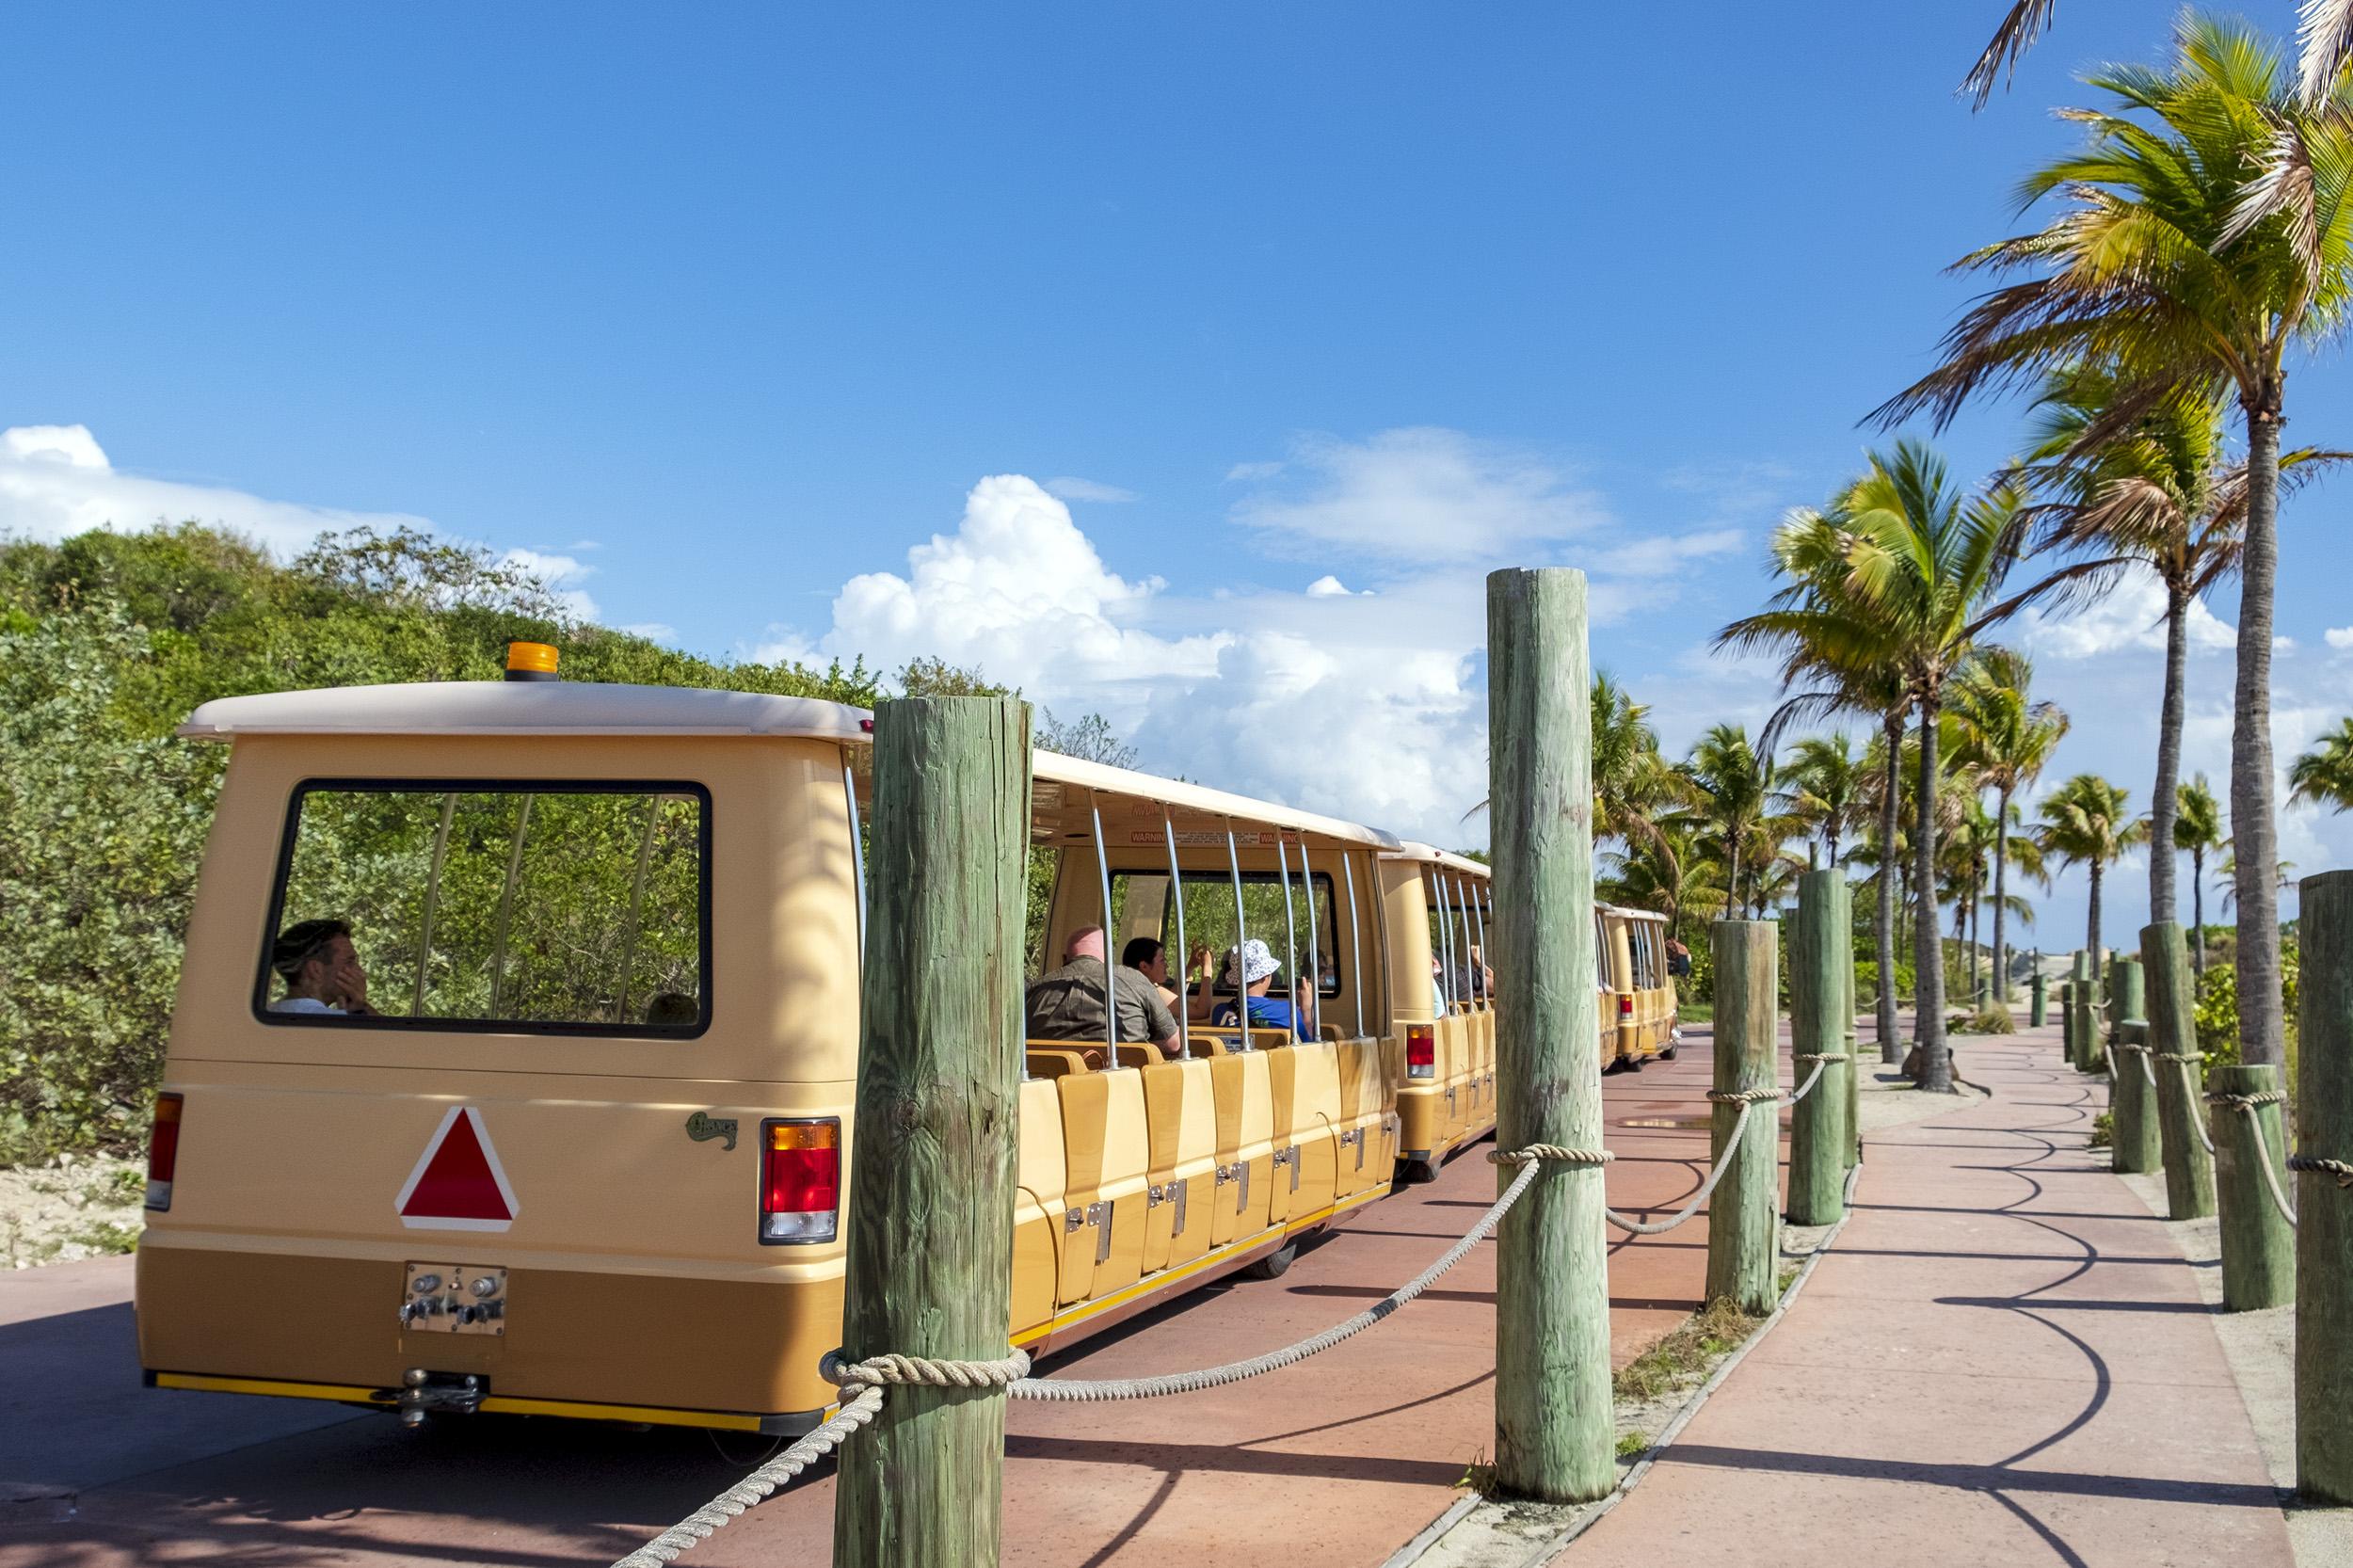 Tram Castaway Cay Bahamas